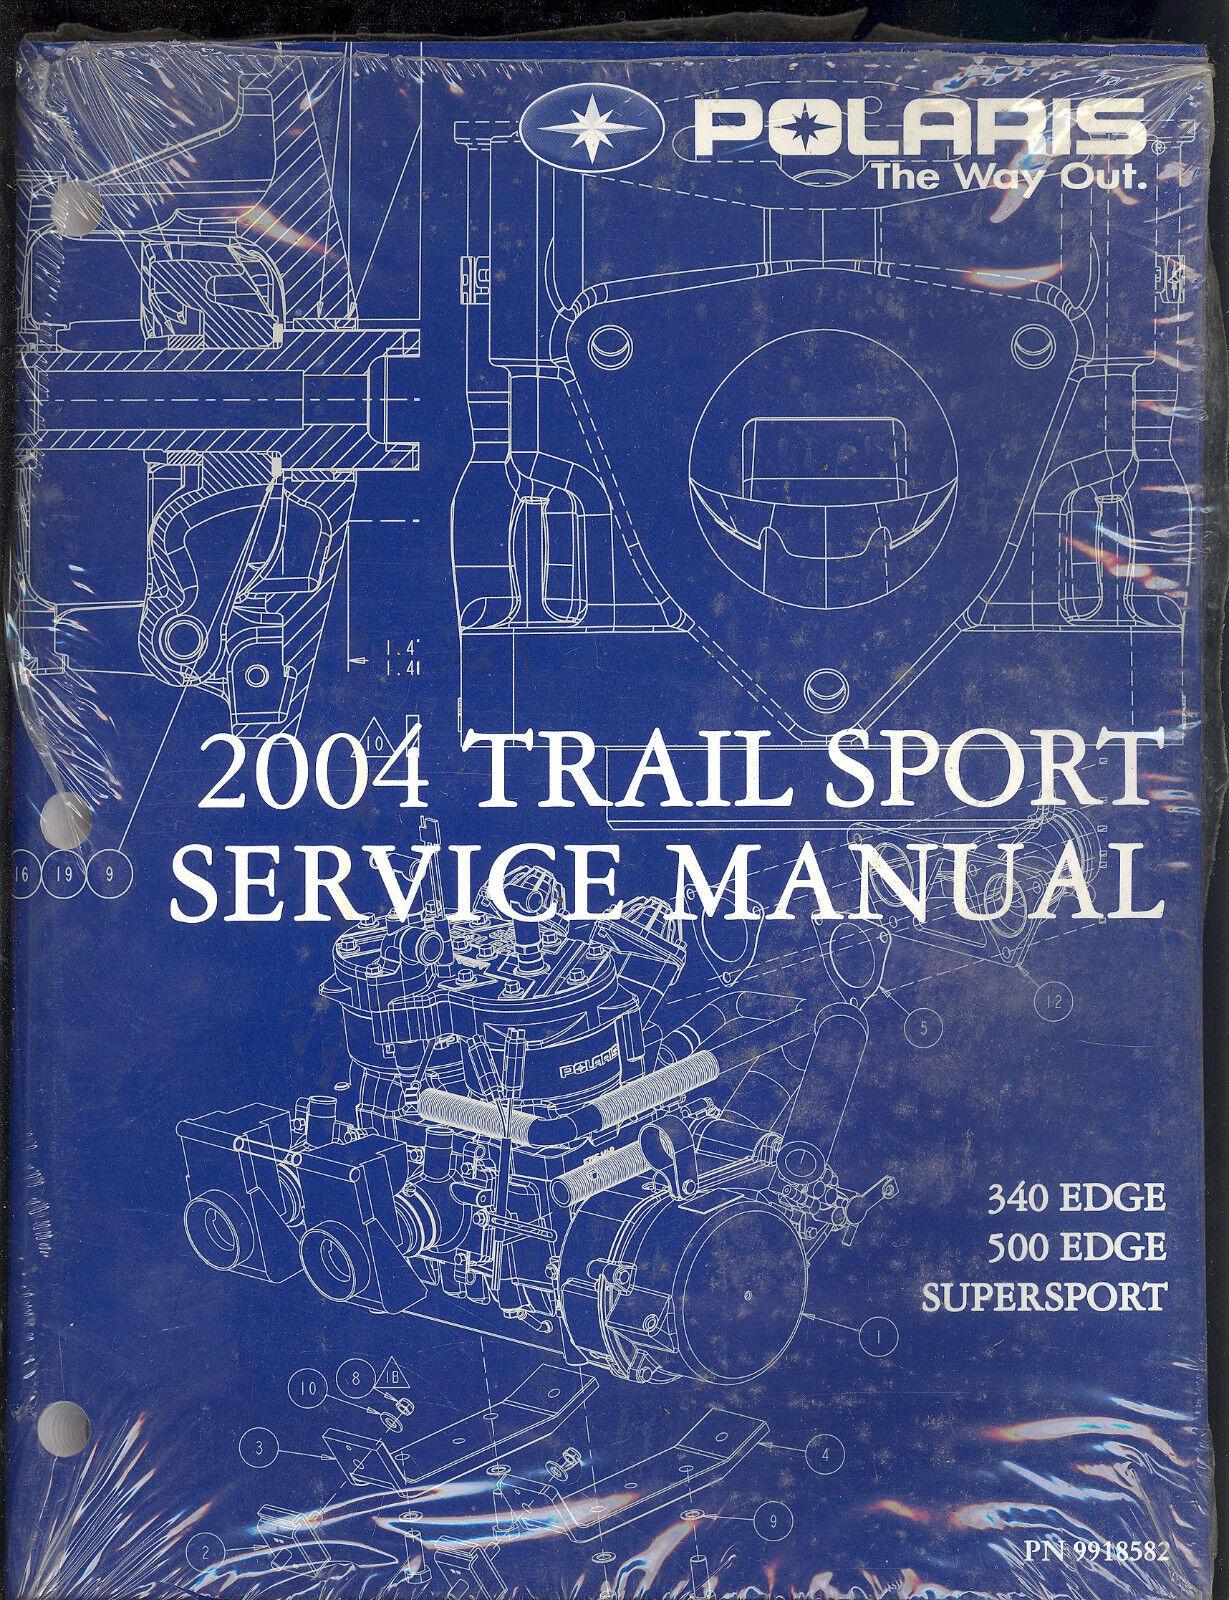 2004 POLARIS TRAIL SPORT SNOWMOBILE SERVICE MANUAL 340 500 EDGE SUPERSPORT